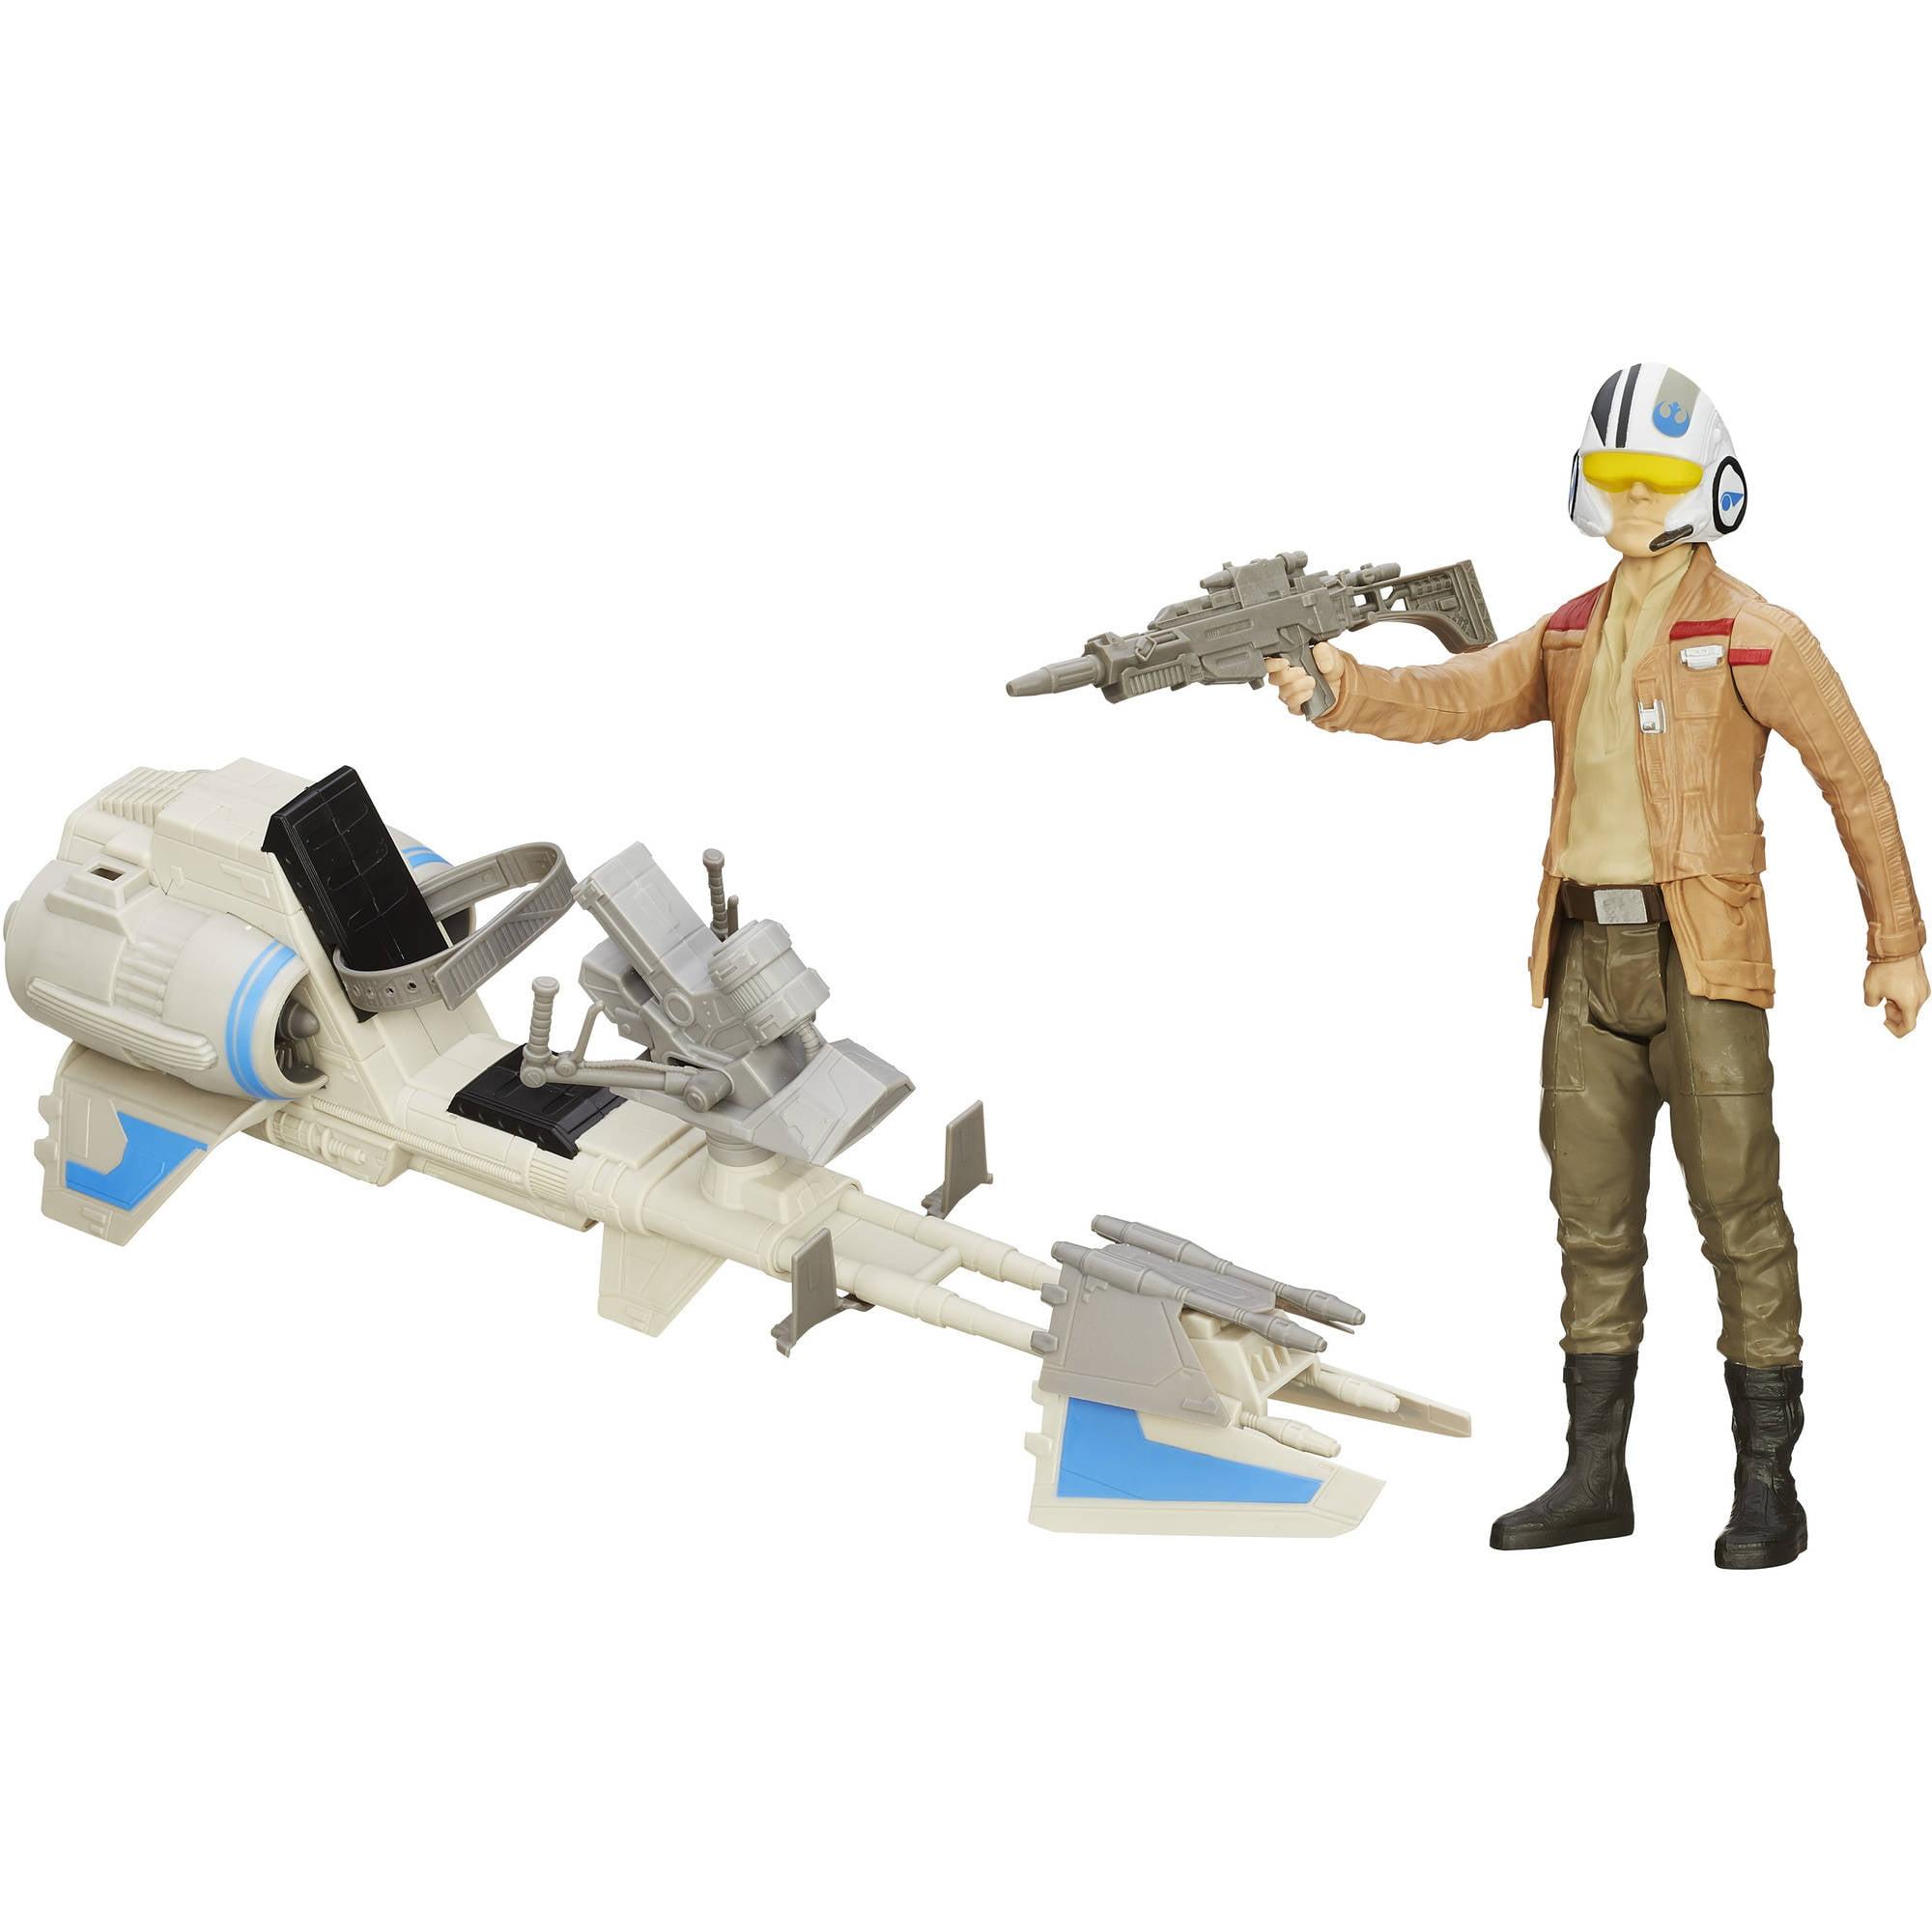 Star Wars The Force Awakens Speeder Bike and Poe Dameron